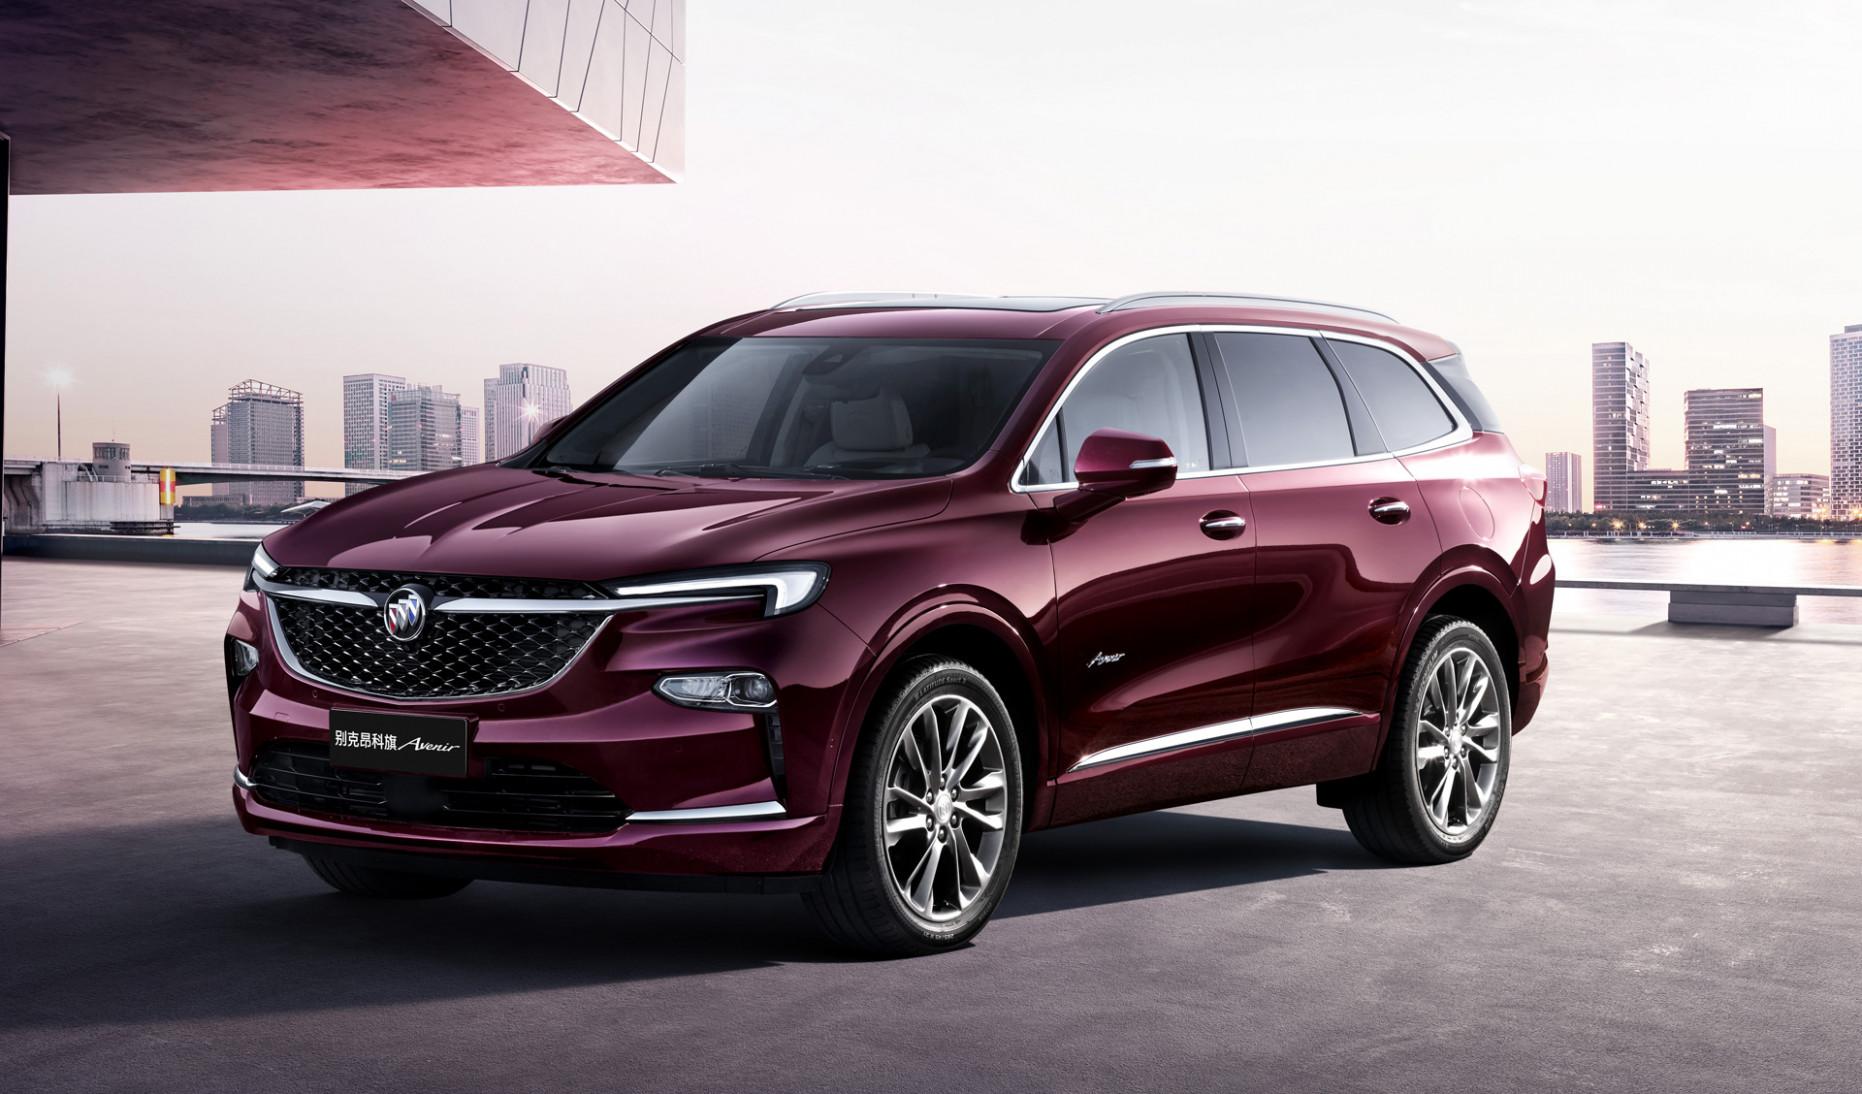 New Concept 2022 Buick Enclave